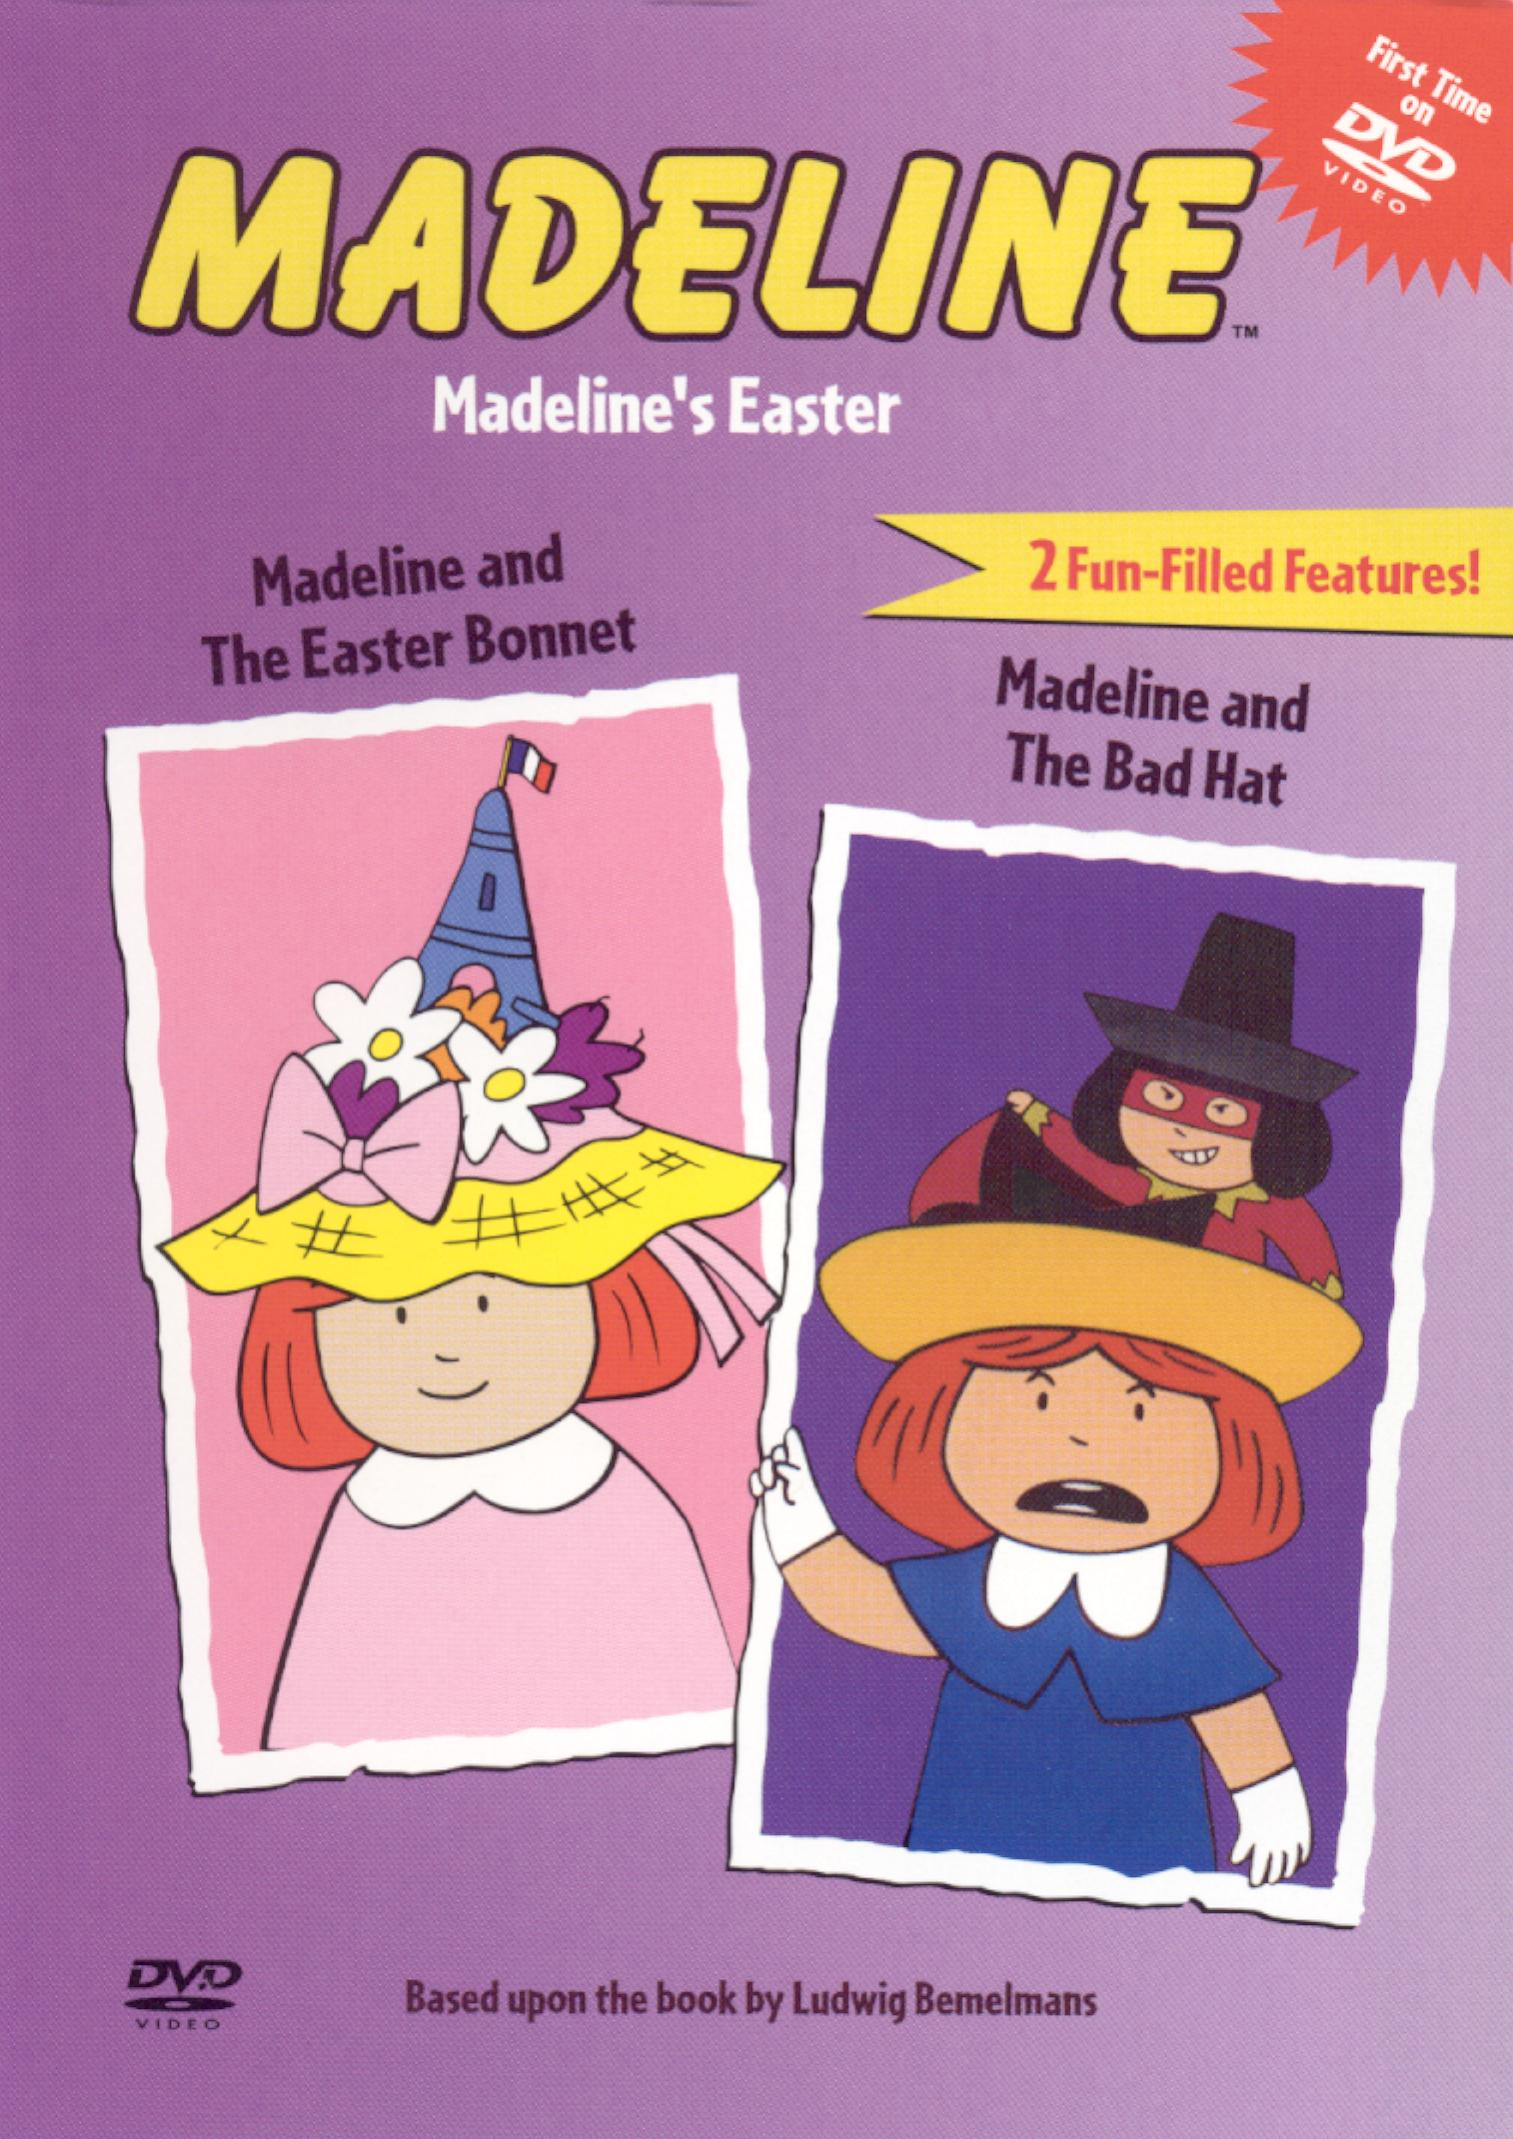 Madeline's Easter